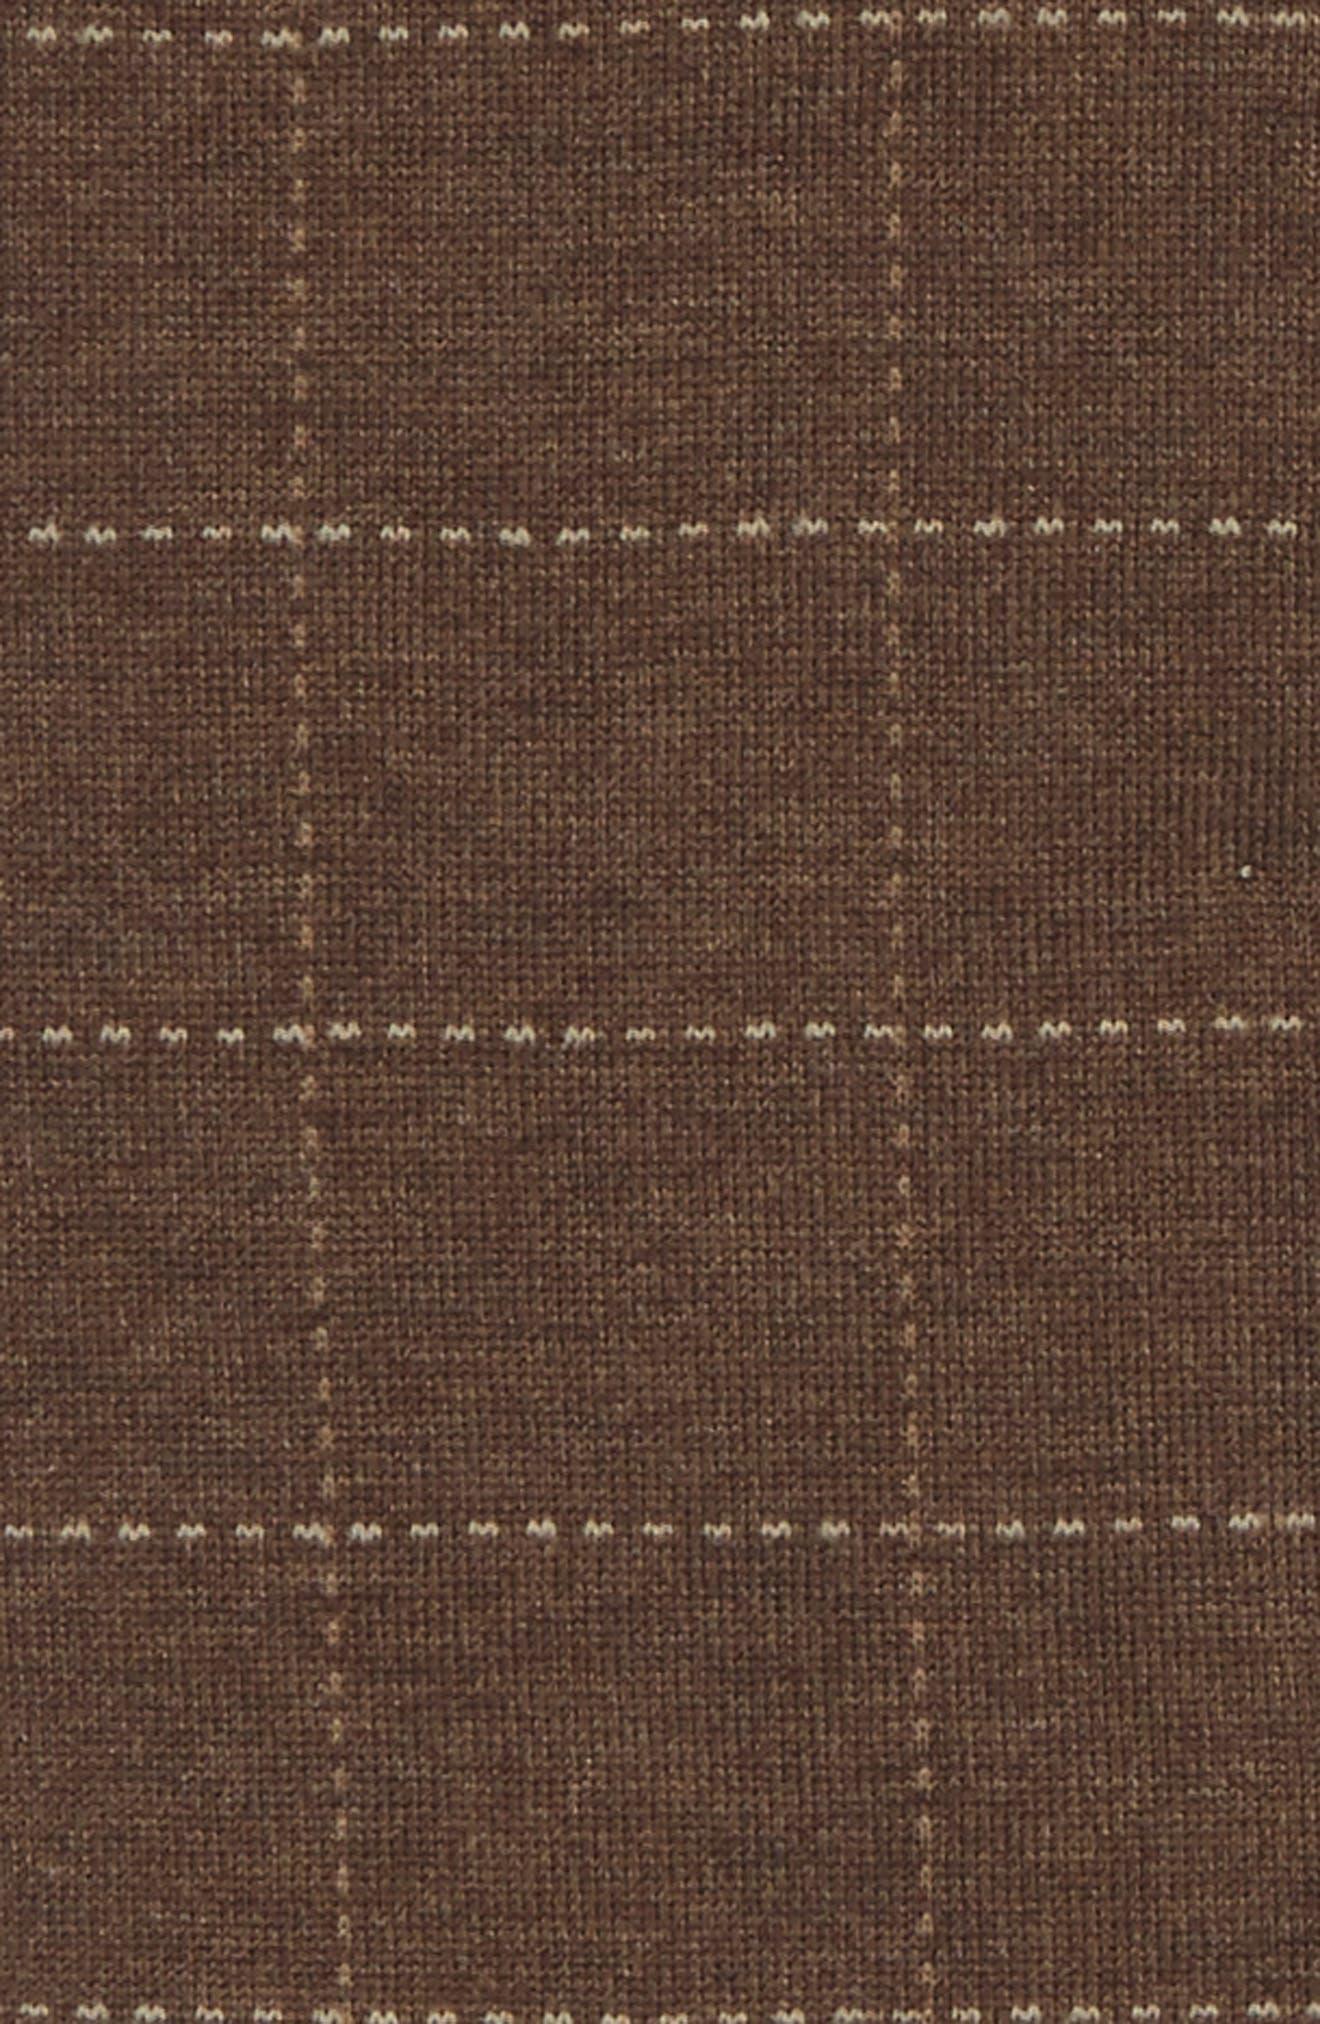 Alternate Image 2  - John W. Nordstrom® Broken Grid Socks